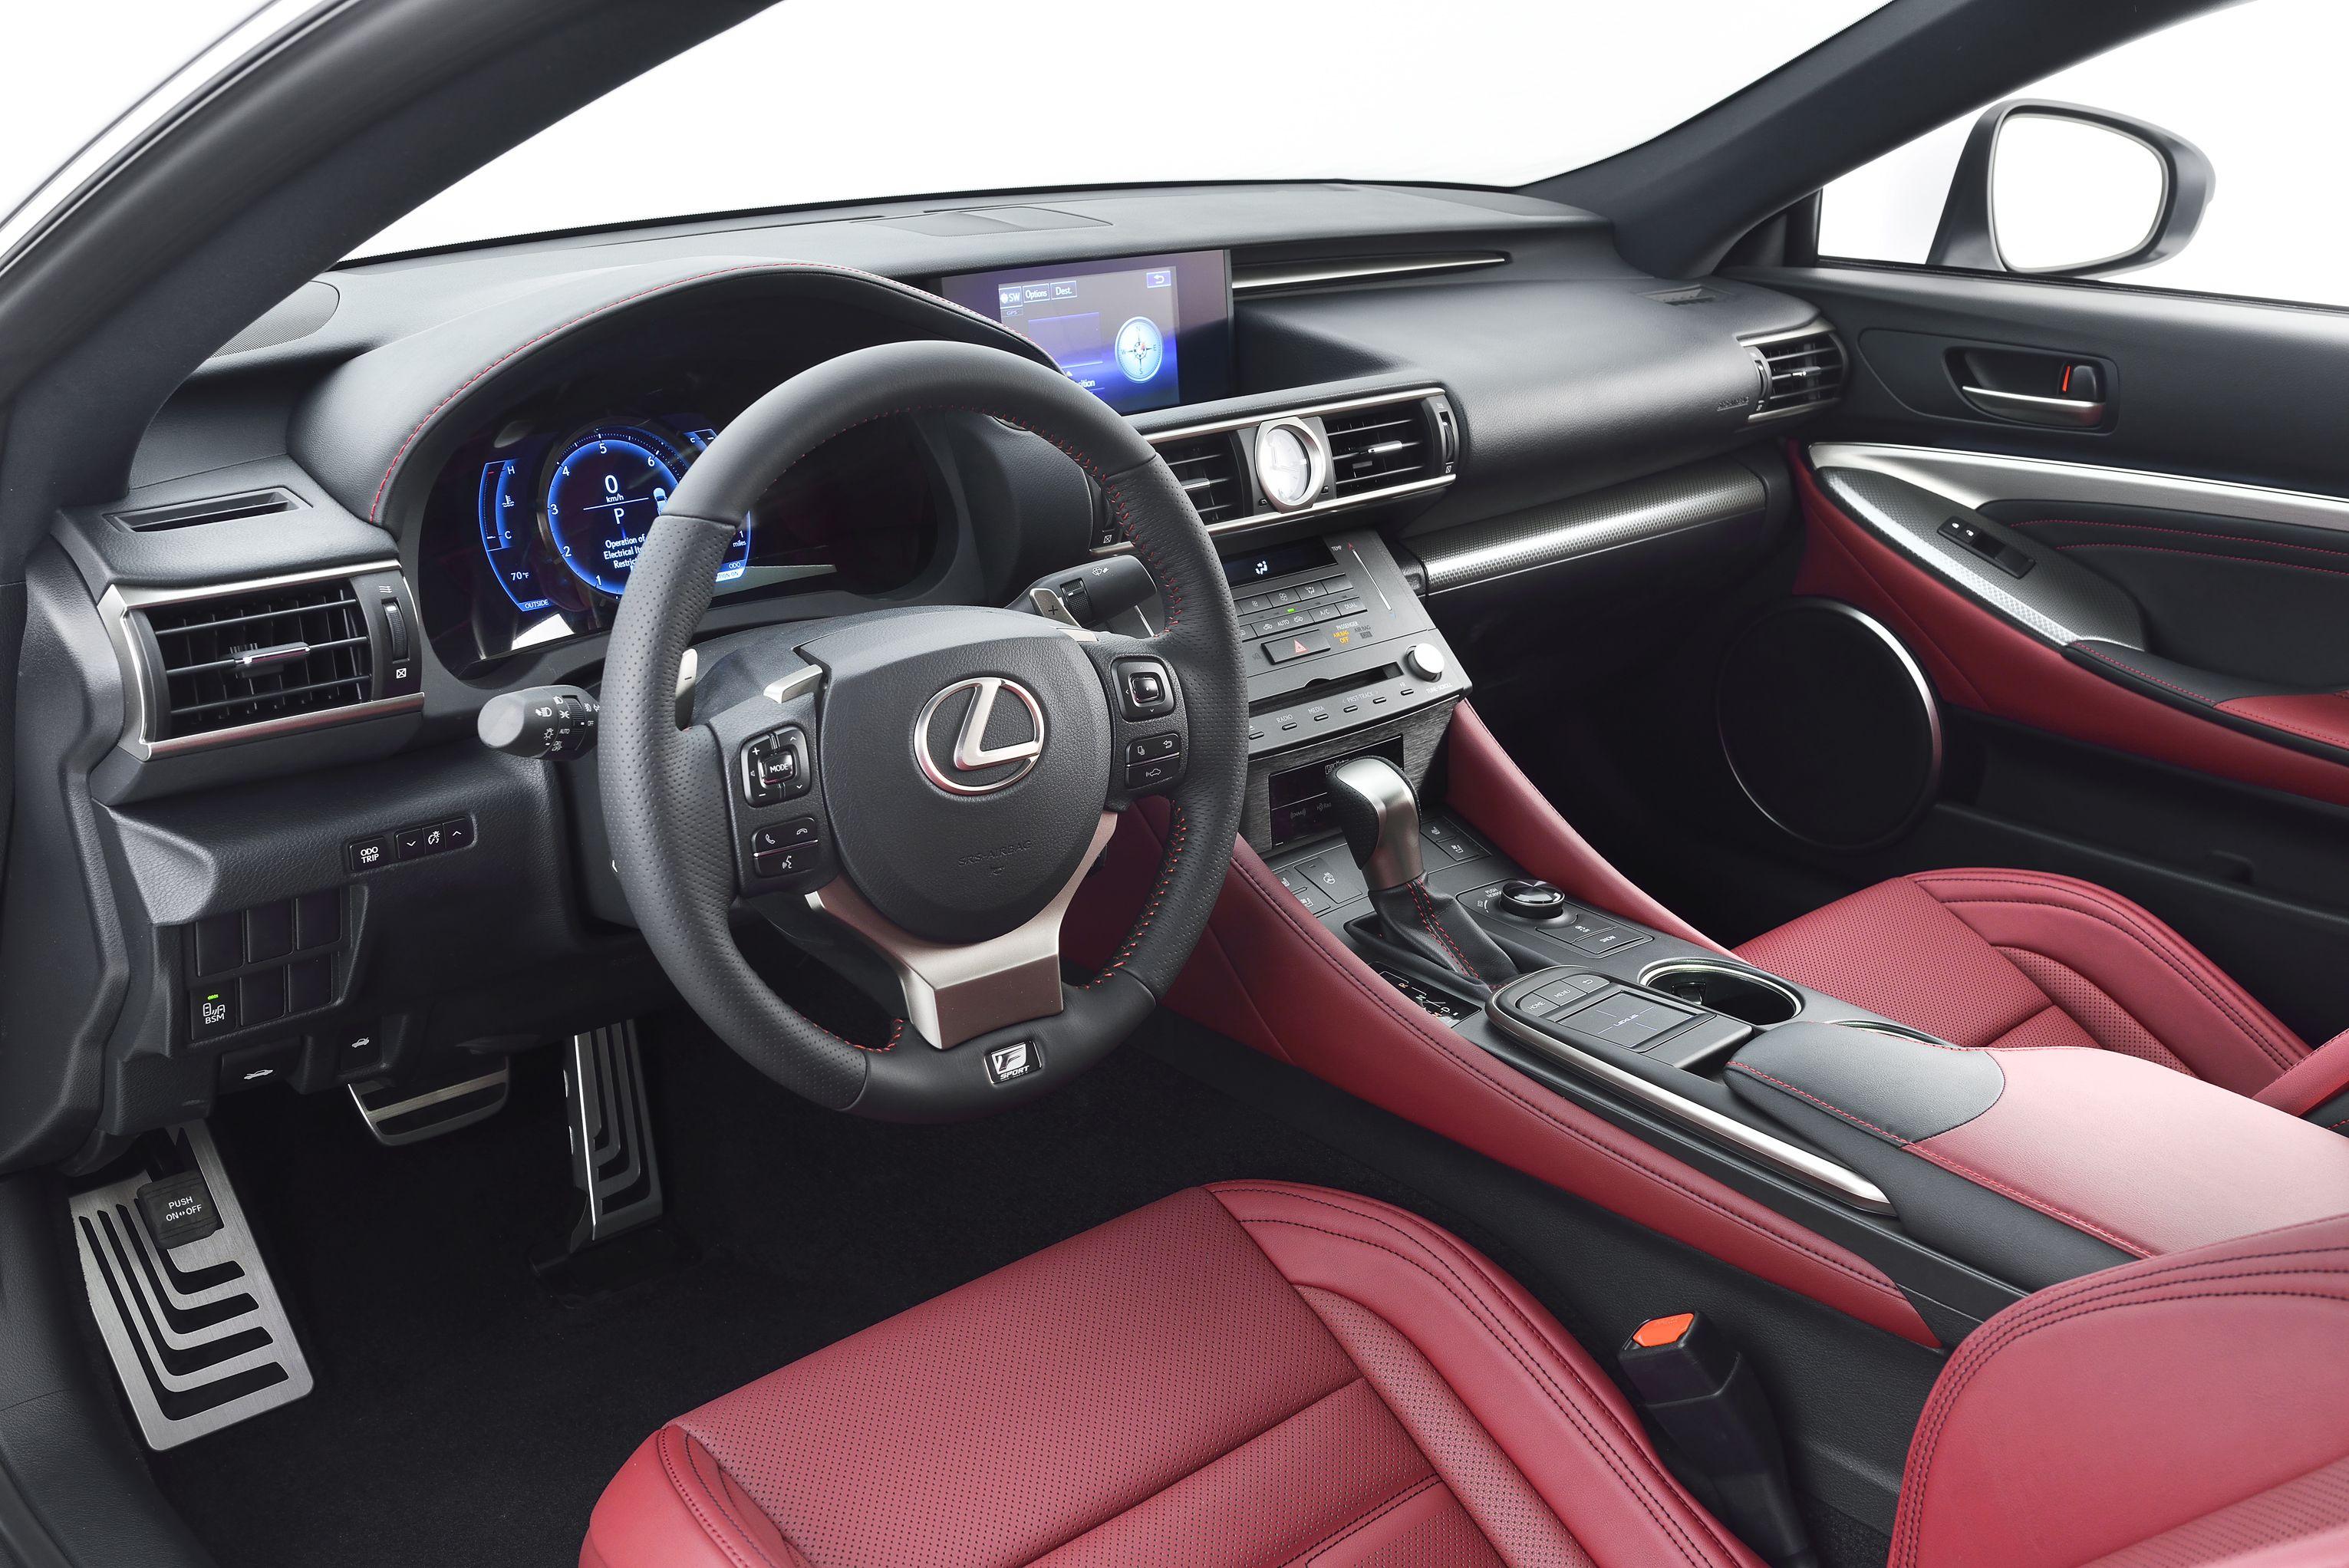 Imagining the 600 Horsepower TwinTurbo Lexus RC FS Coupe